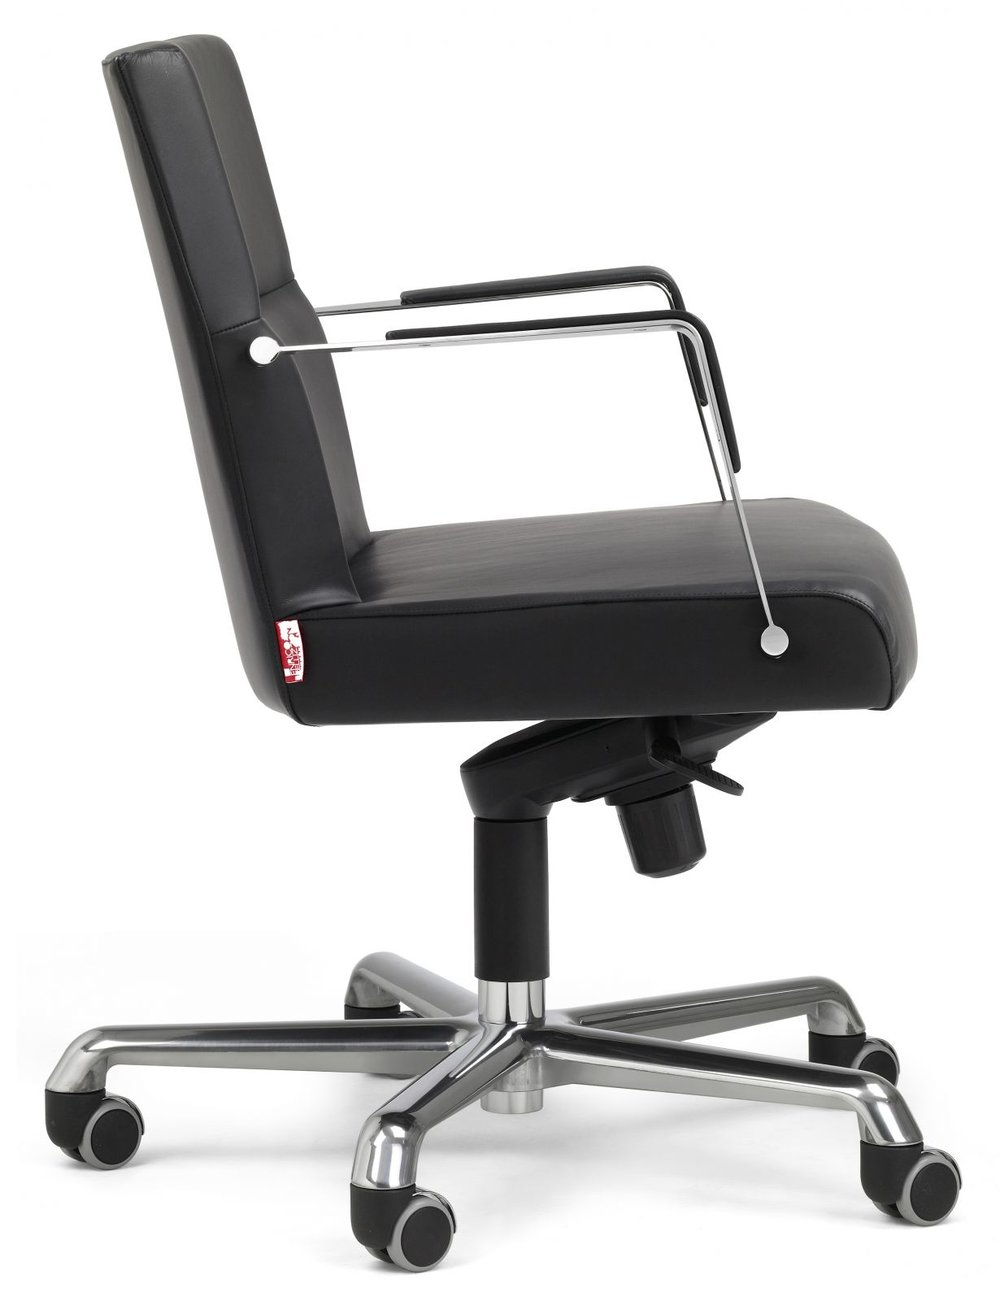 modern-office-chairs-Italian-furniture-designer-chairs (13).jpg